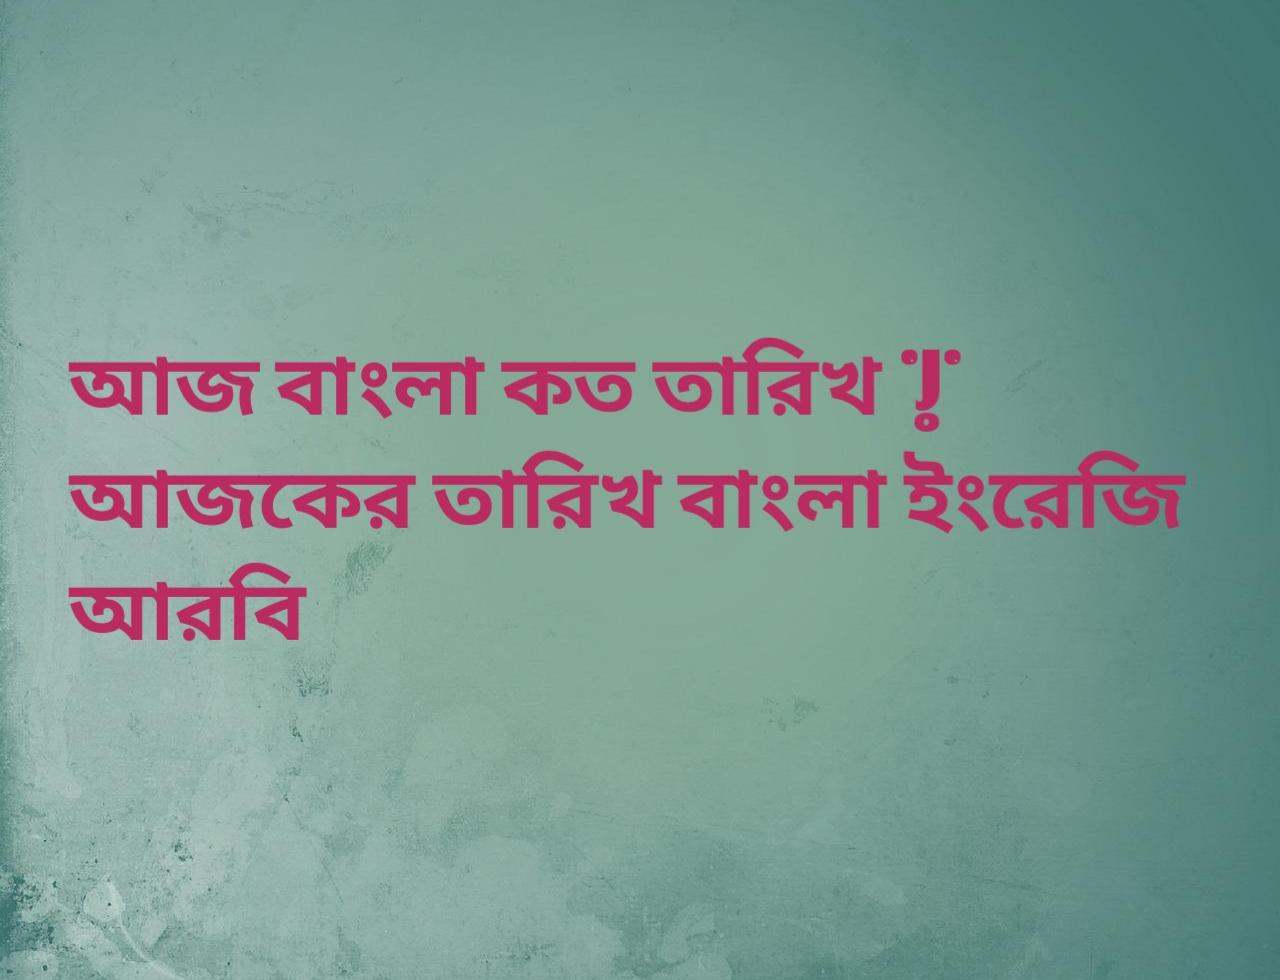 today Bengali date and time | আজ বাংলা কত তারিখ | আজকের তারিখ বাংলা ইংরেজি আরবি |bangla date today | আজ আরবি কত তারিখ